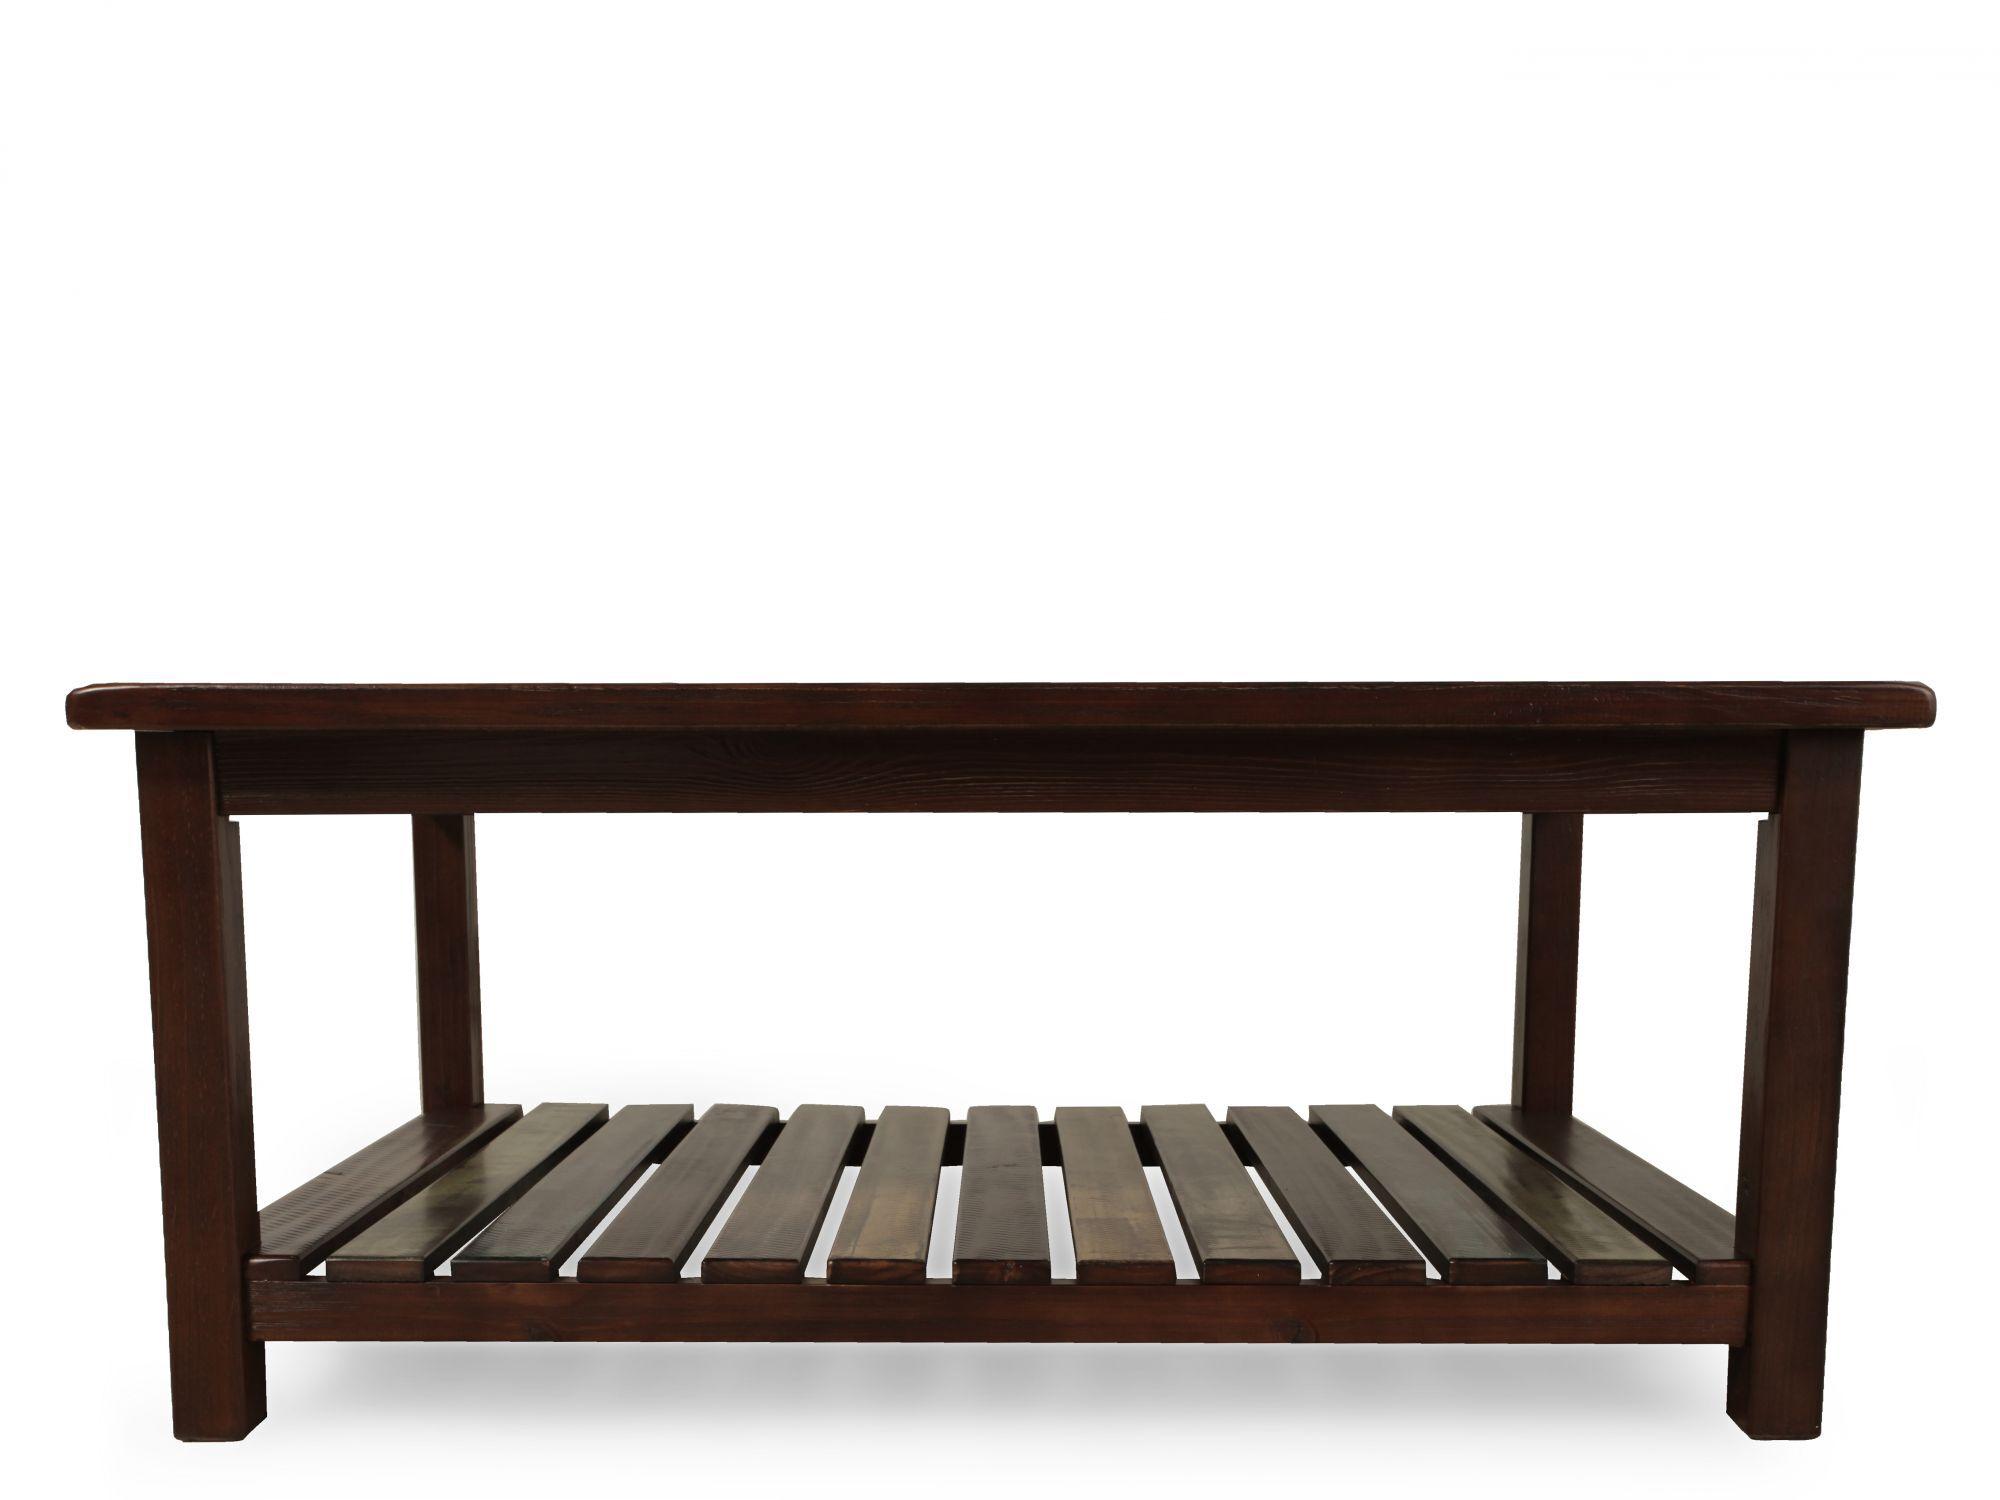 Images Xylophone Shelf Rectangular Casual Cocktail Tableu0026nbsp;in Brown  Xylophone Shelf Rectangular Casual Cocktail Tableu0026nbsp;in Brown